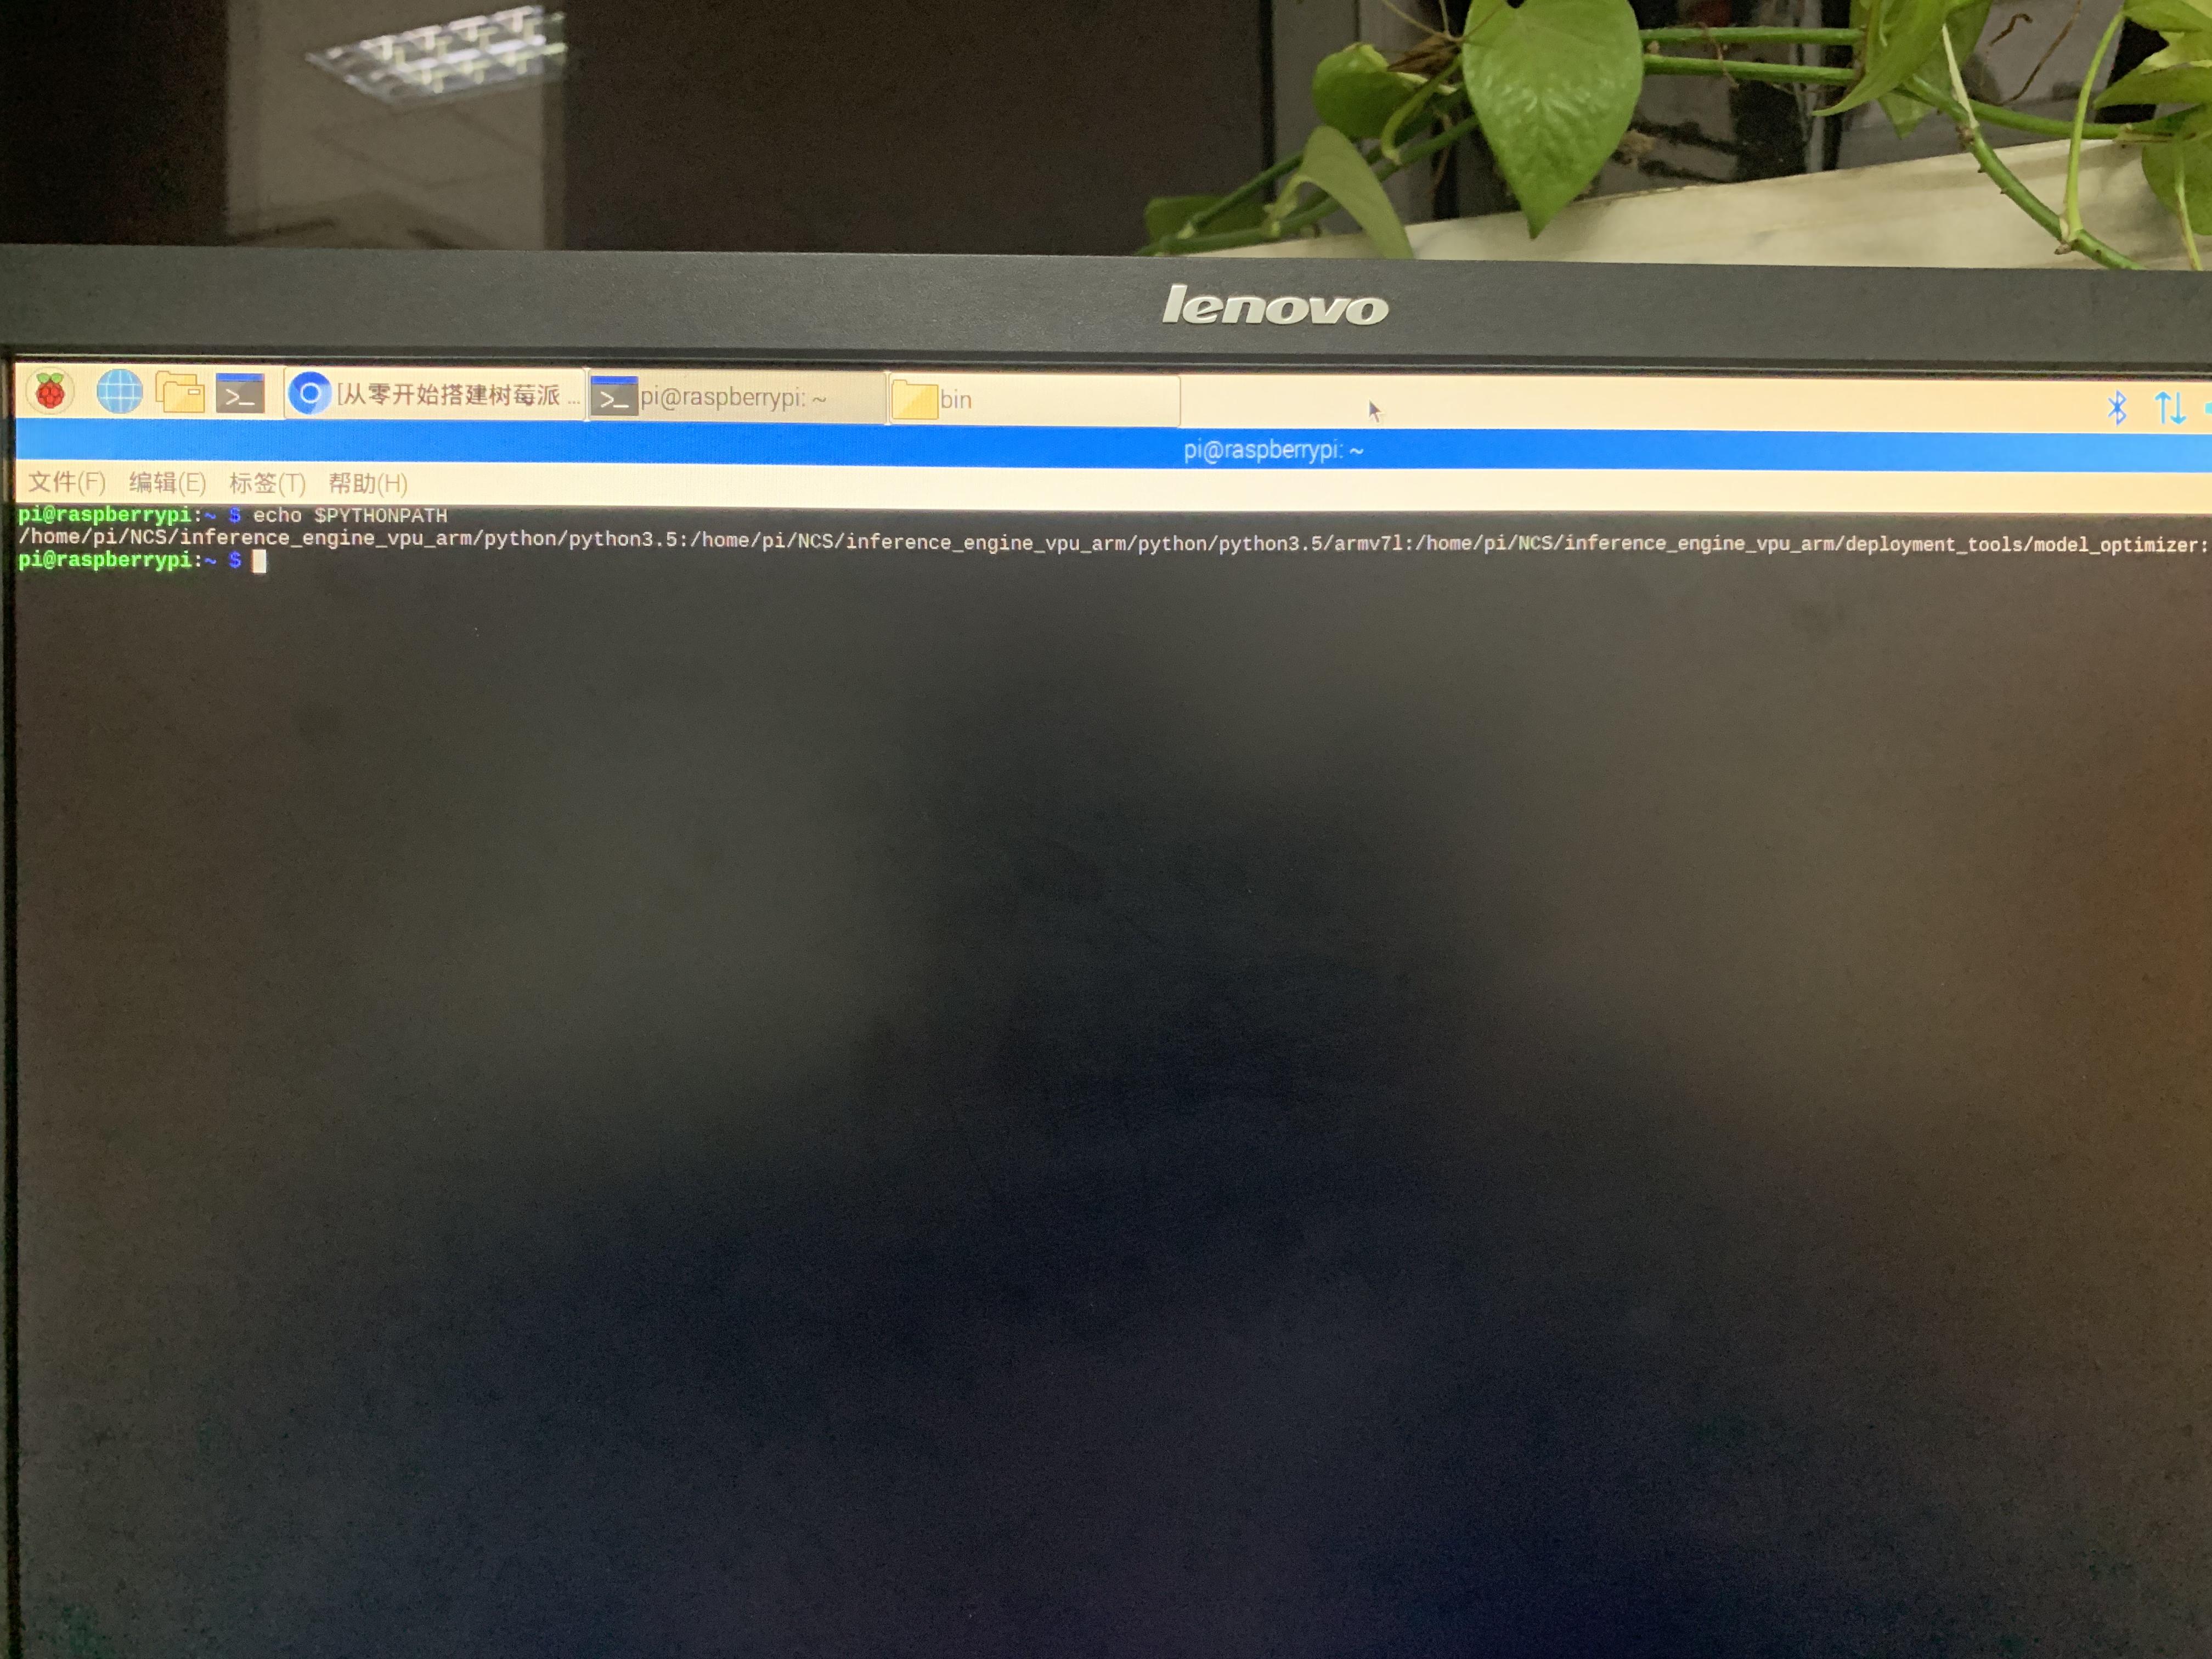 ImportError: No module named 'openvino' · Issue #33 · PINTO0309